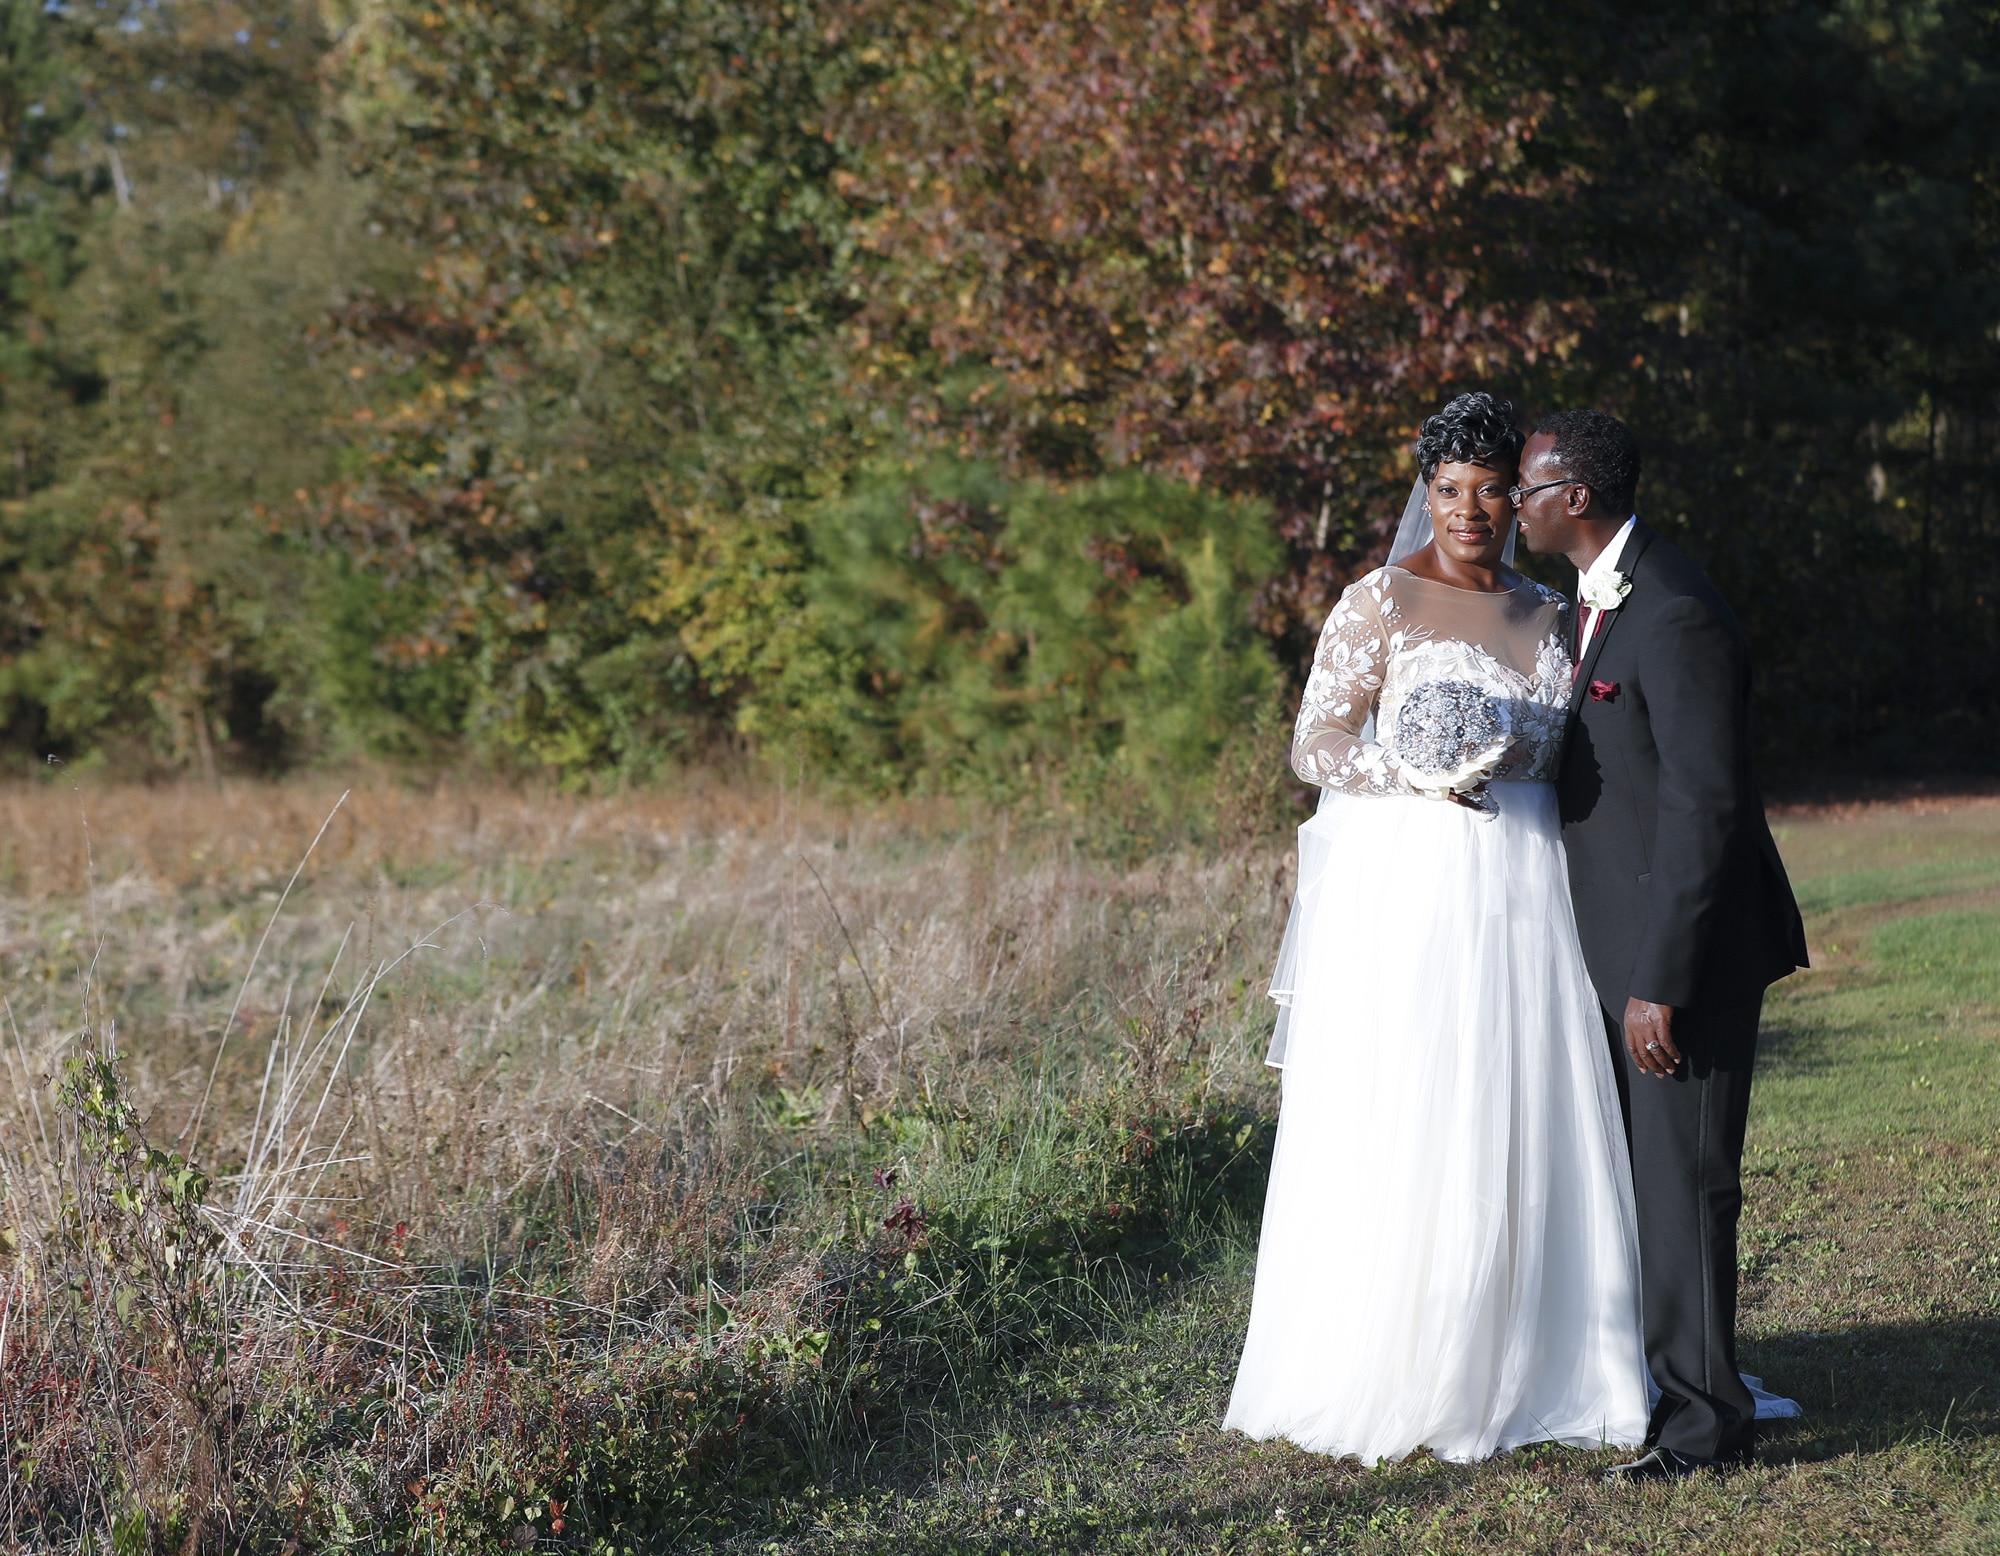 Hippodrome Wedding Photographer | Richmond Wedding Photographer |  Sneak Preview:  Joy and Rick's Amazing Wedding!